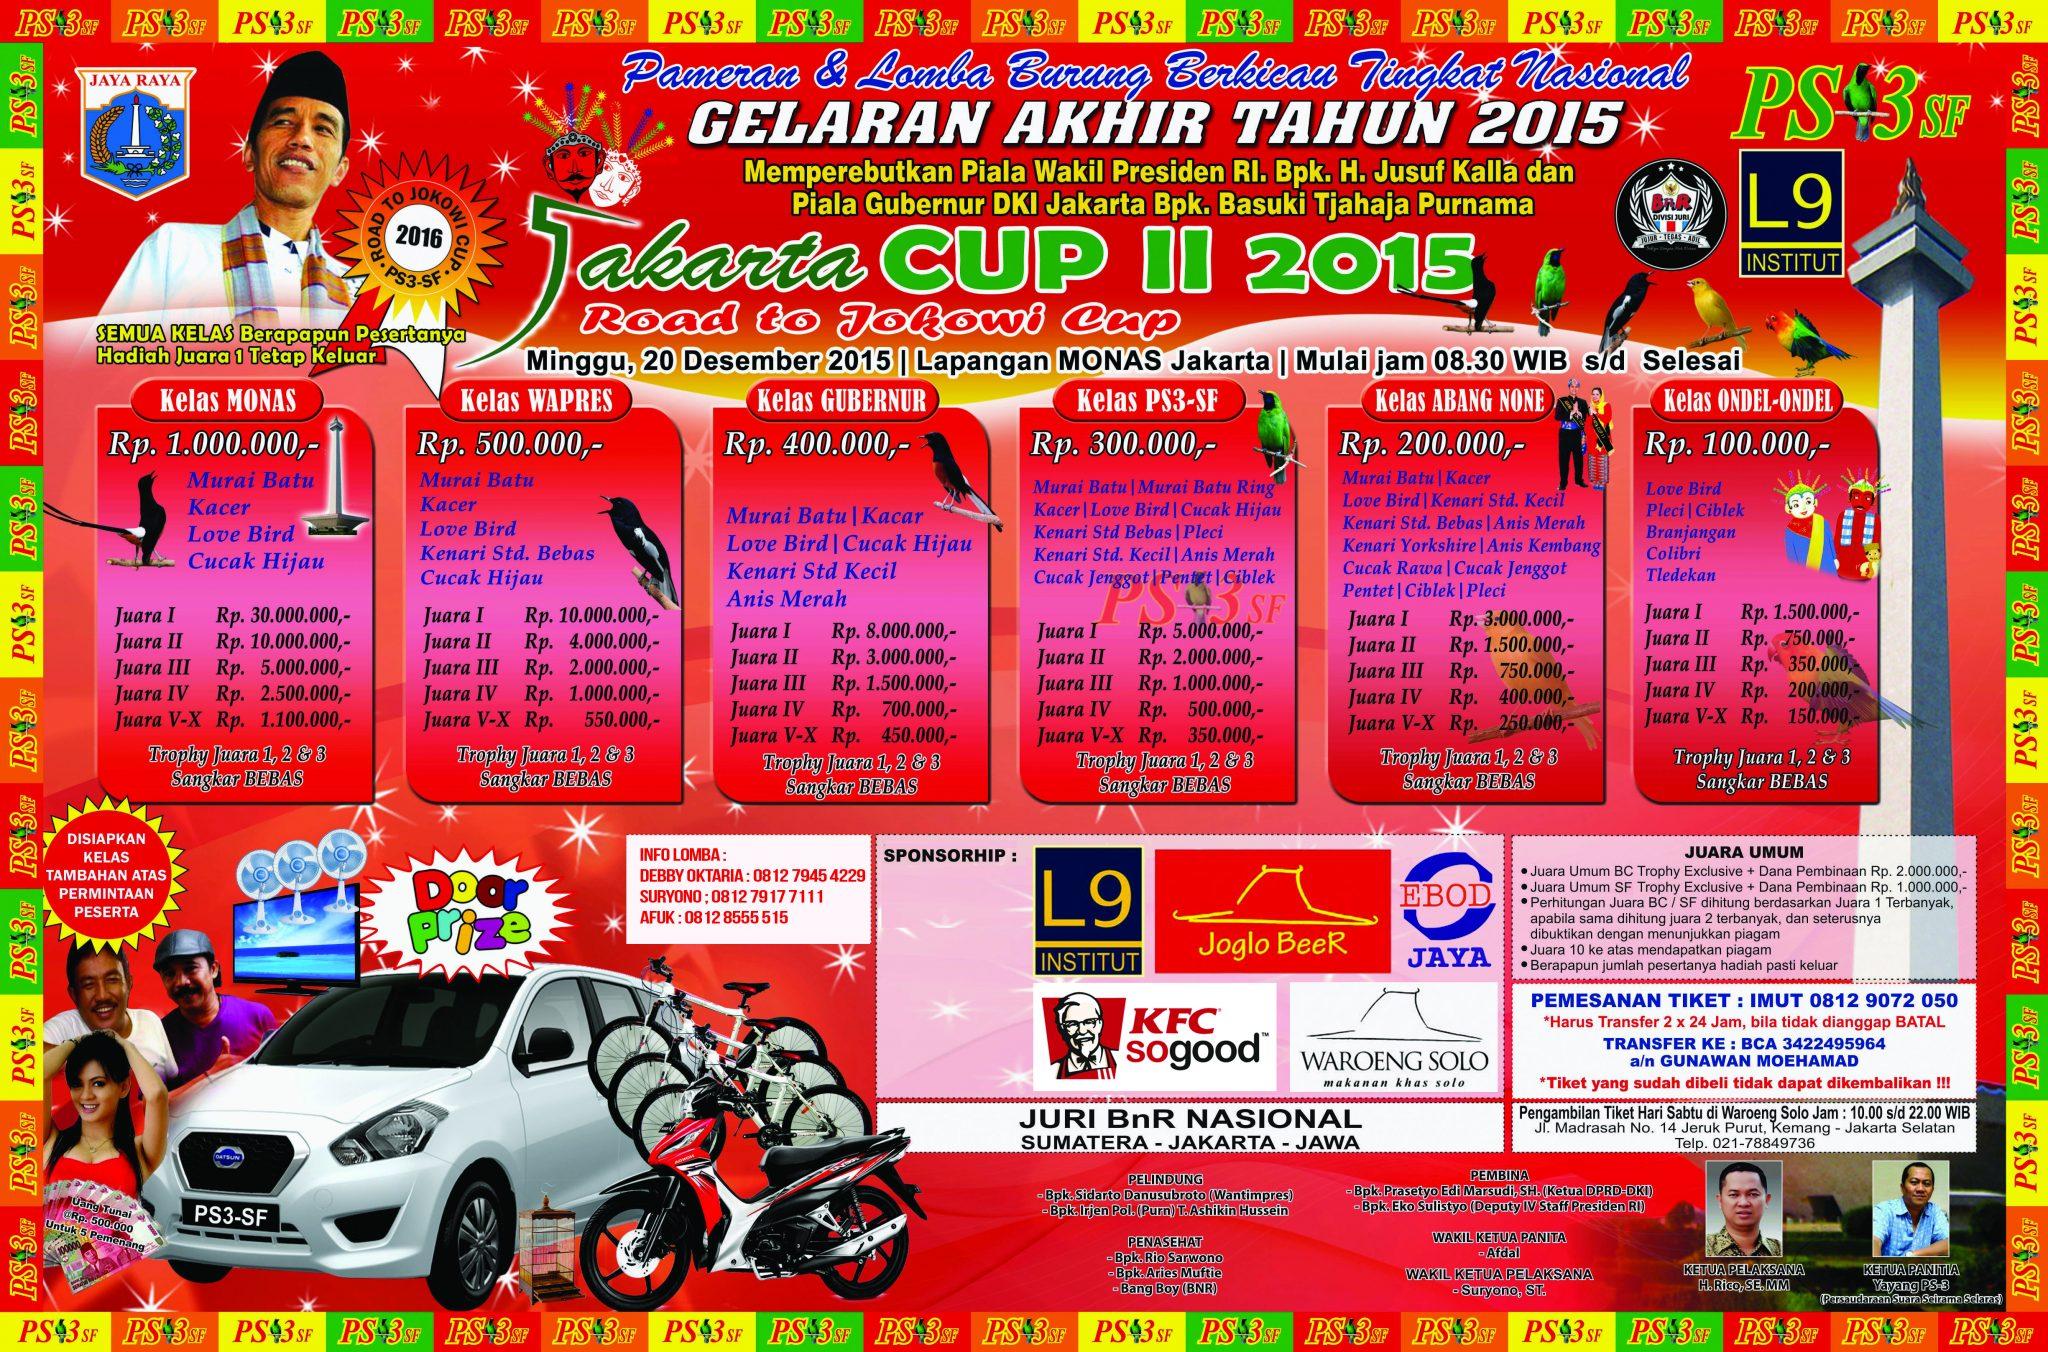 LOMBA BURUNG JAKARTA CUP II 2015 - 20 DESEMBER 2015